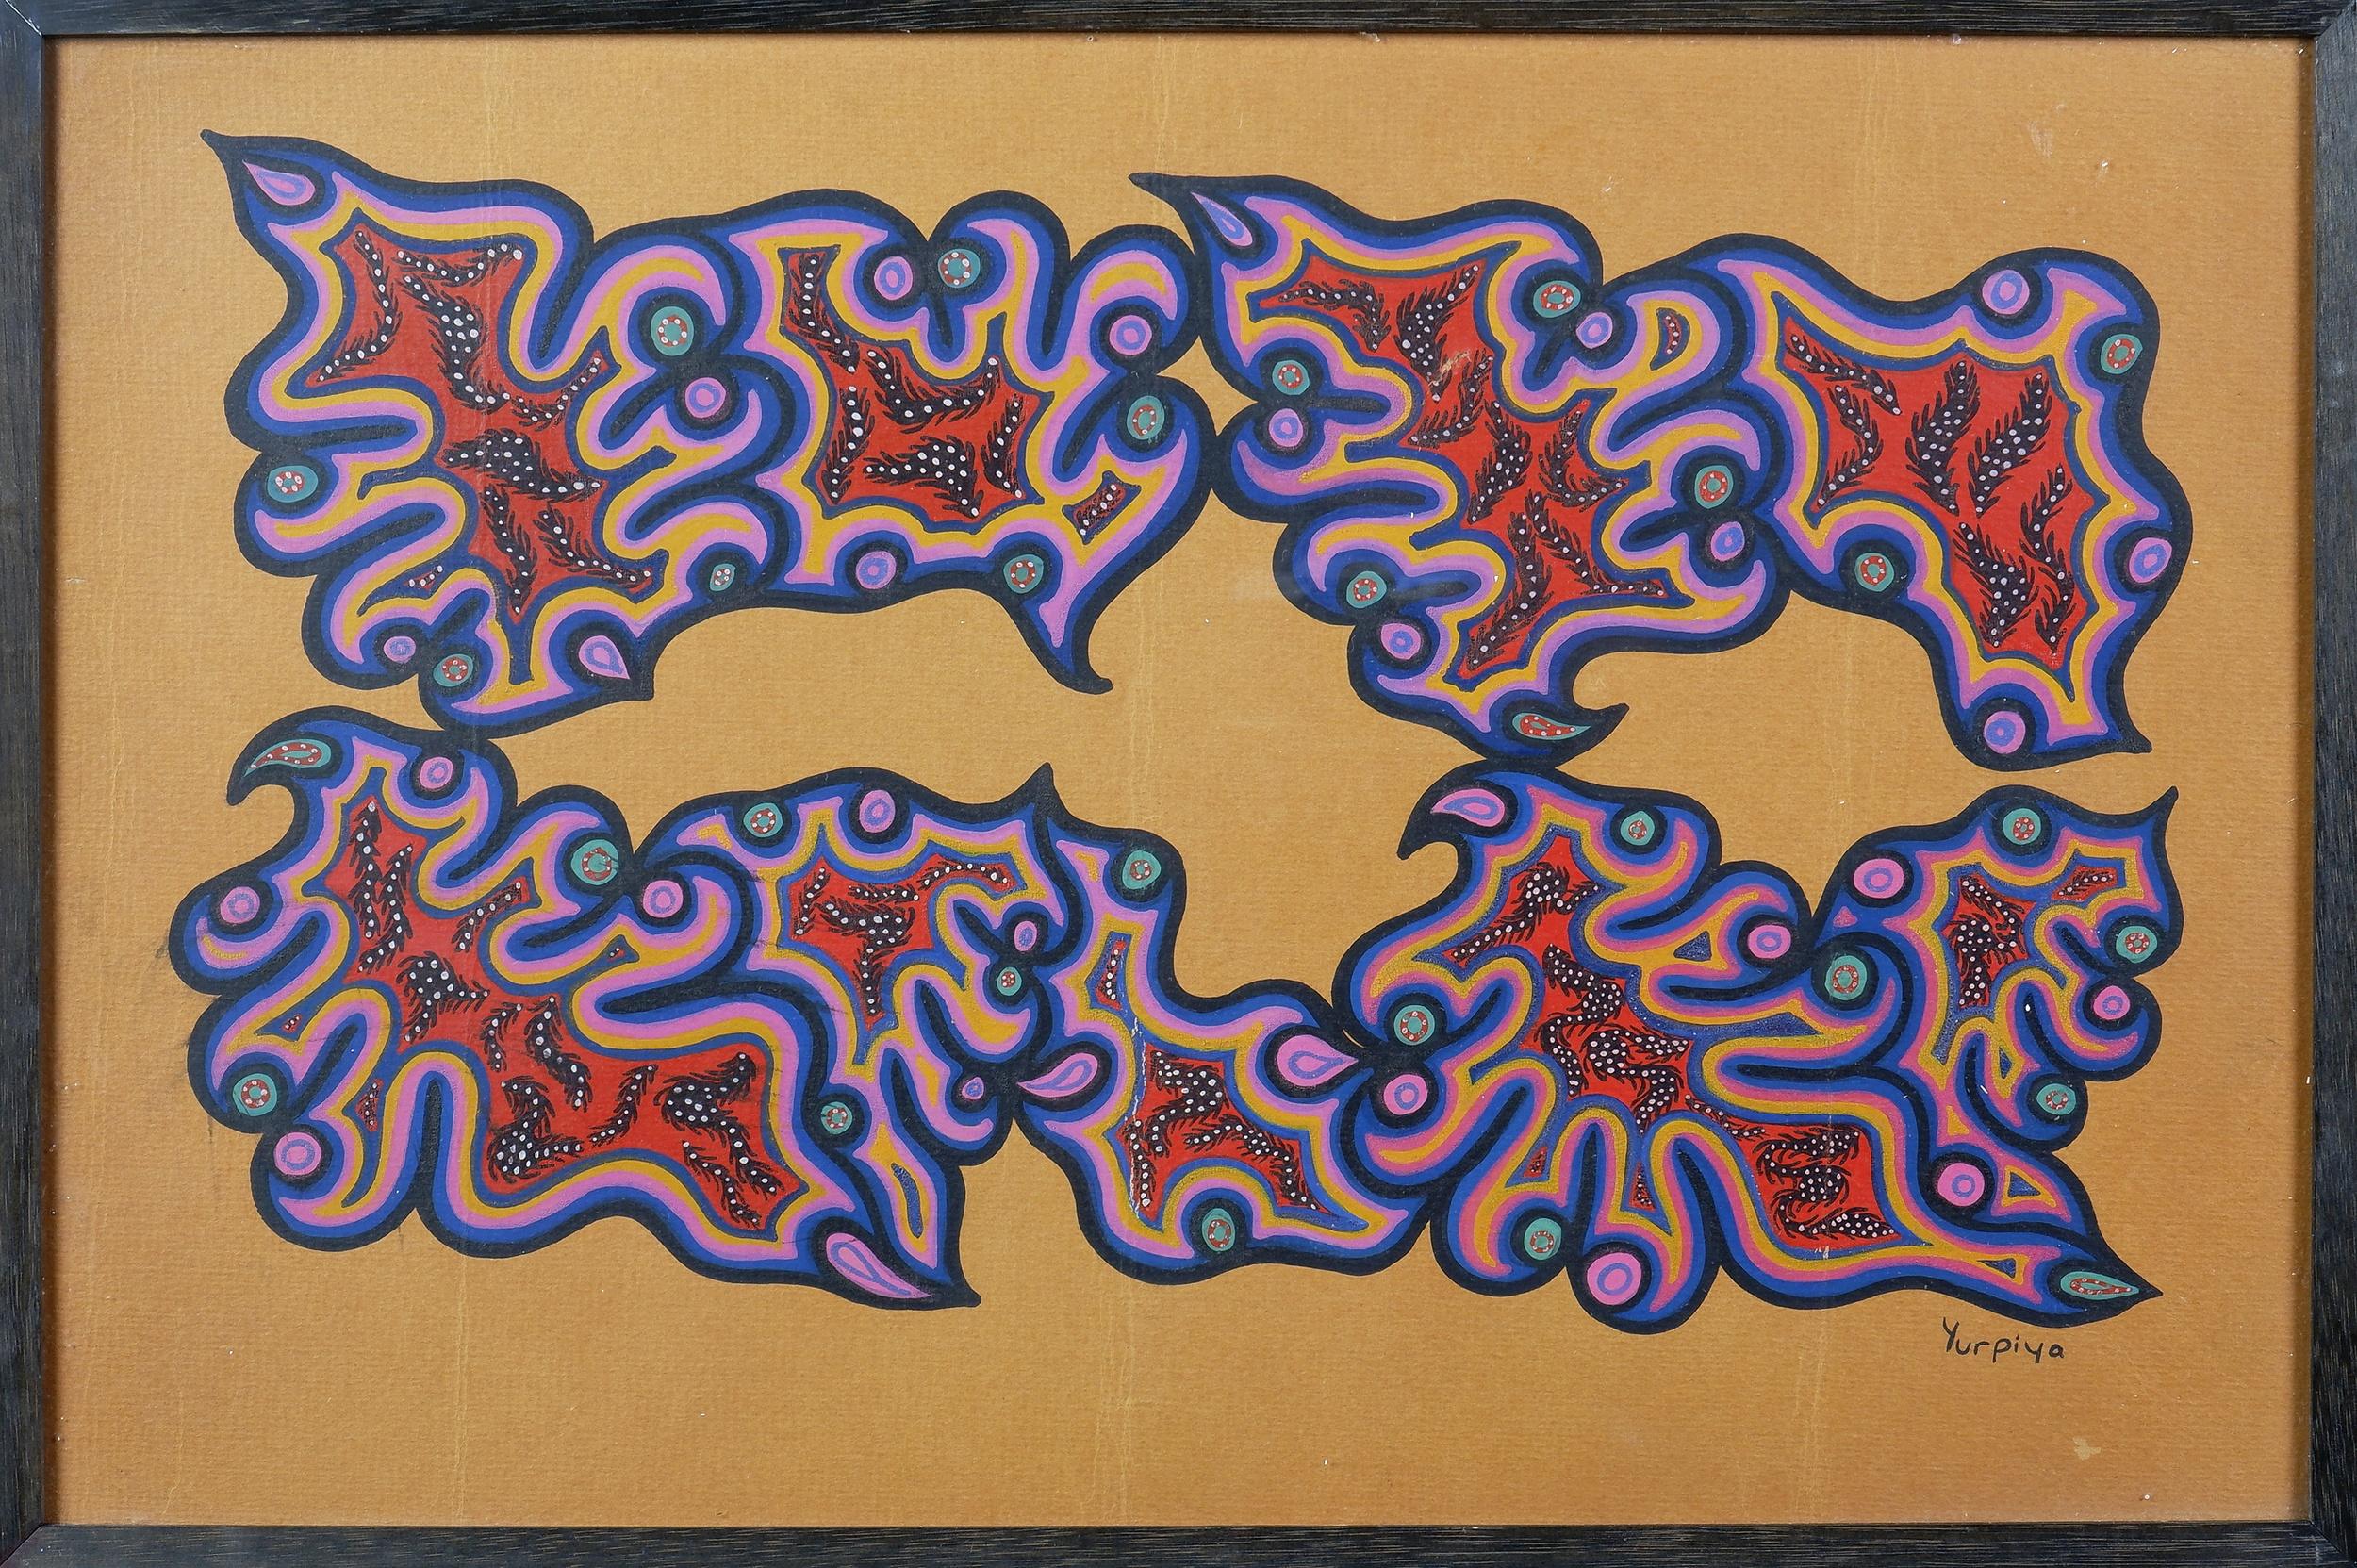 'Yurpiya Lionel (born 1960, Pitjantjatjara language group), Untitled late 1960s, Gouache on Paper'